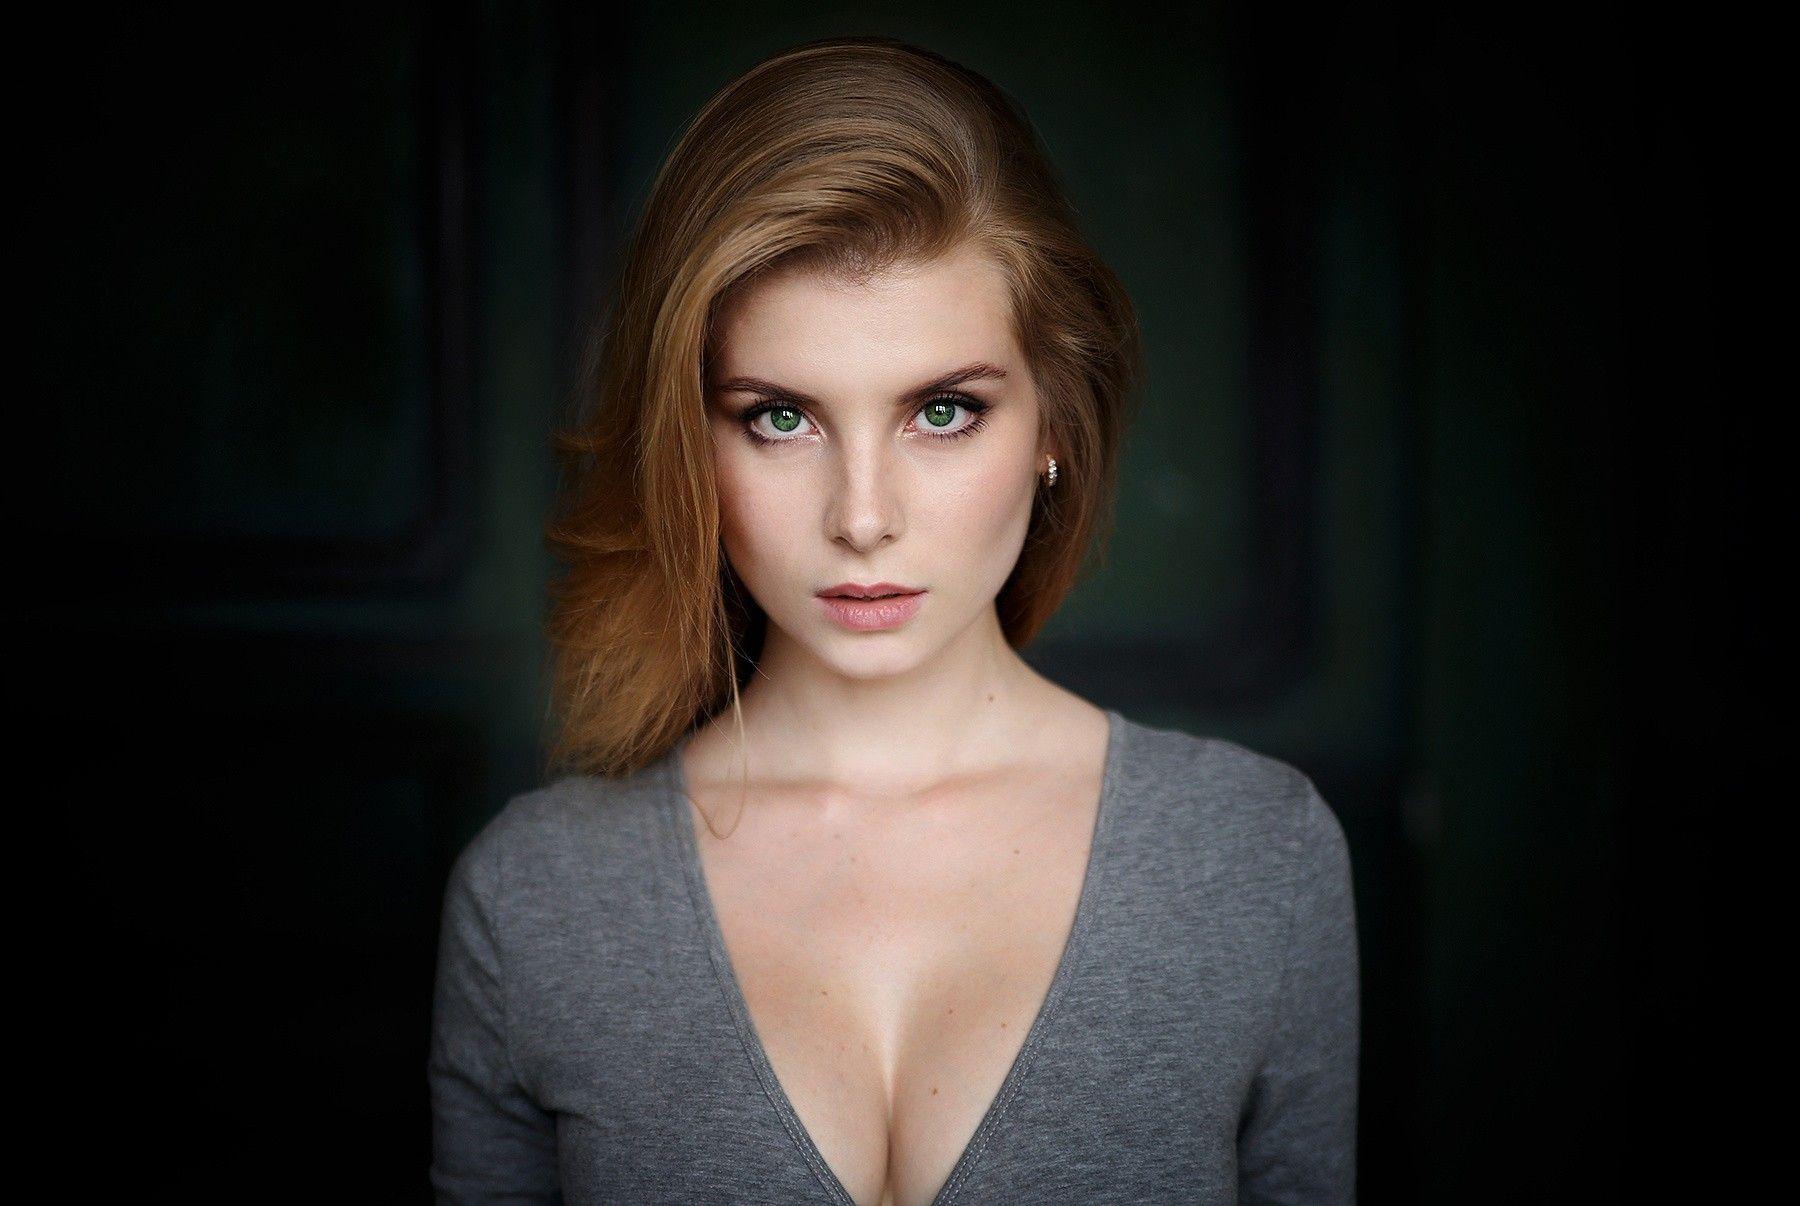 Russian mature irene redhead hot girls wallpaper